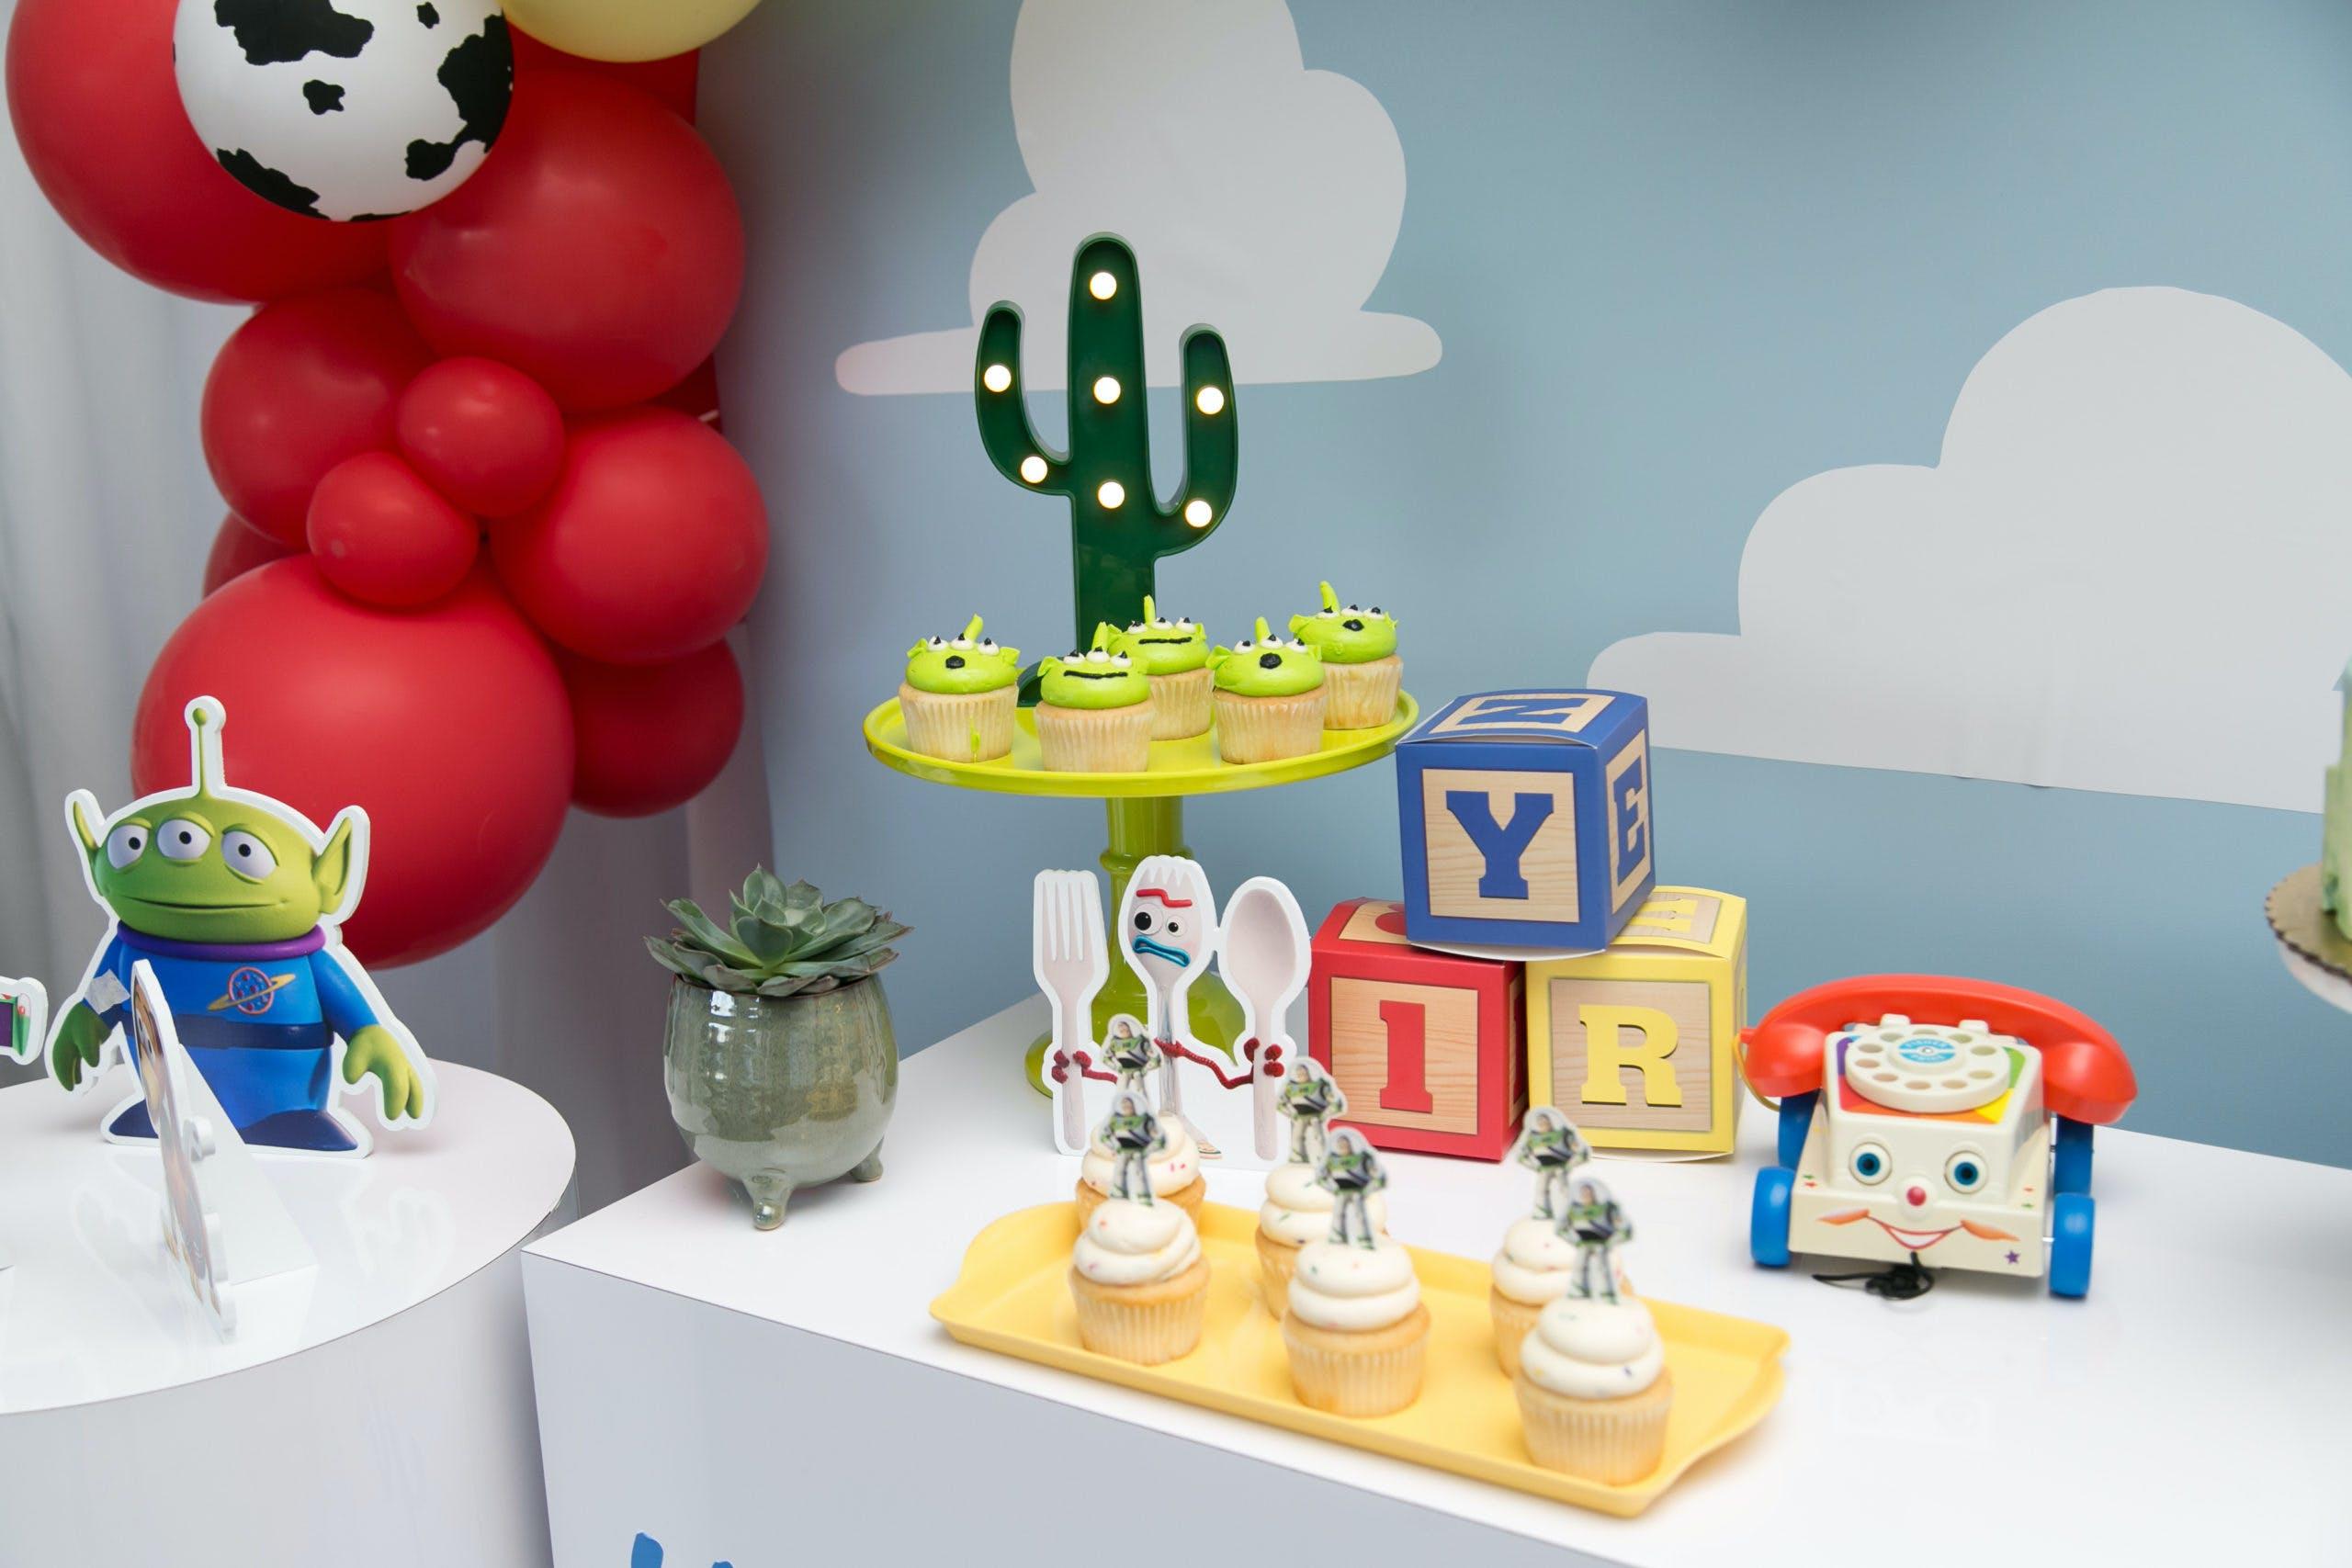 Playful Toy Story Themed 5th Birthday Celebration